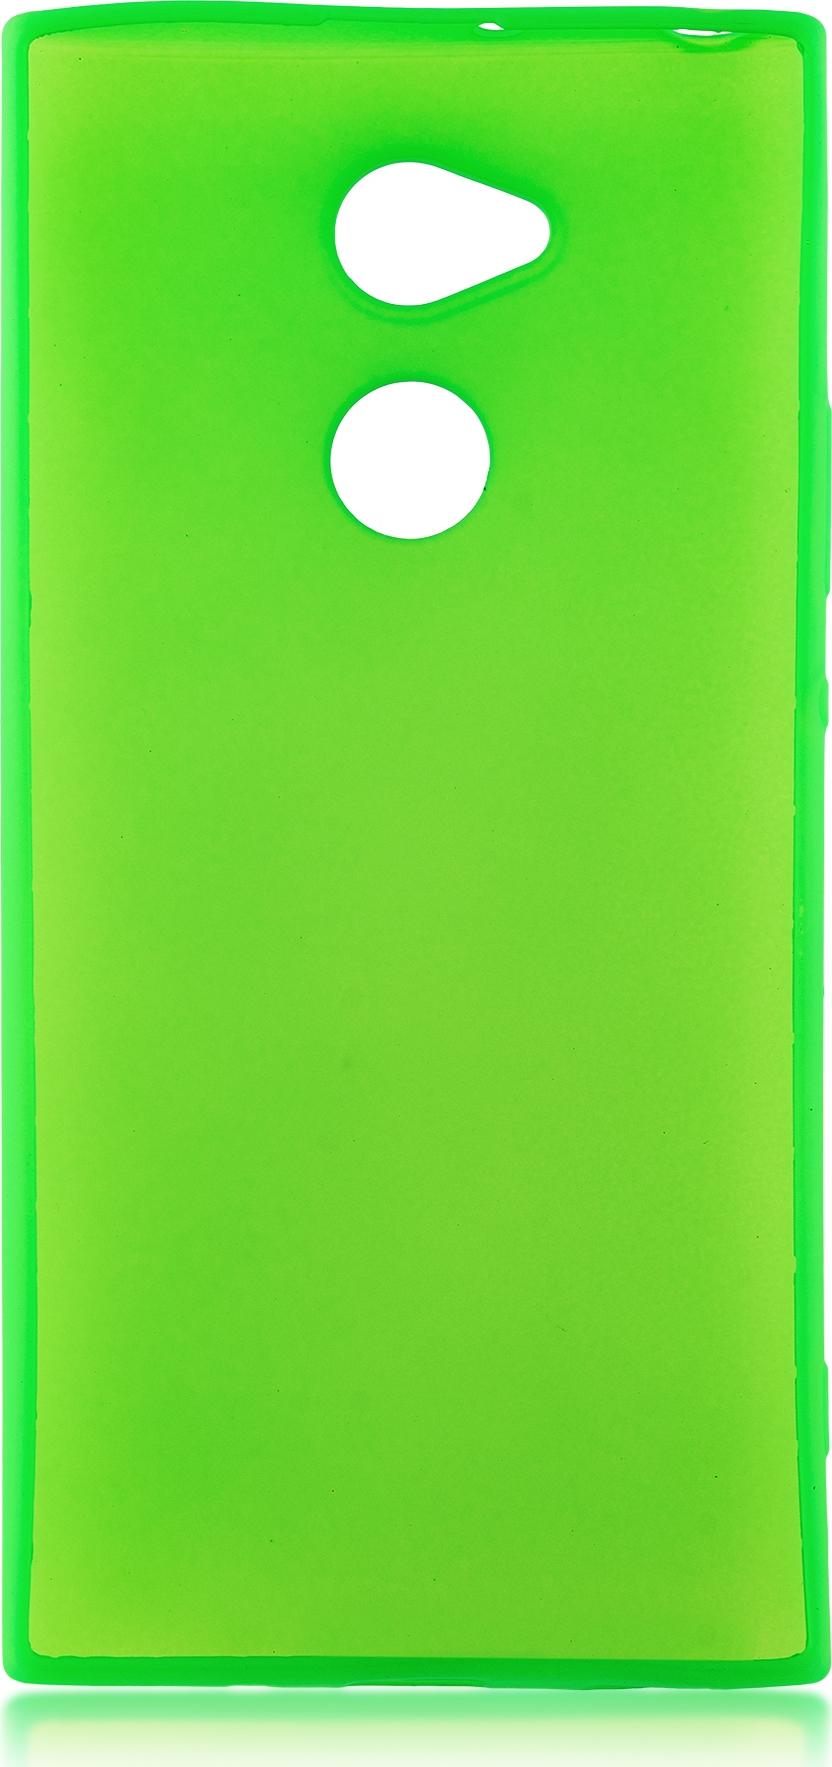 Чехол Brosco Colourful для Sony Xperia XA2 Ultra, зеленый чехол для sony h4113 xperia xa2 dual brosco силиконовая накладка прозрачный